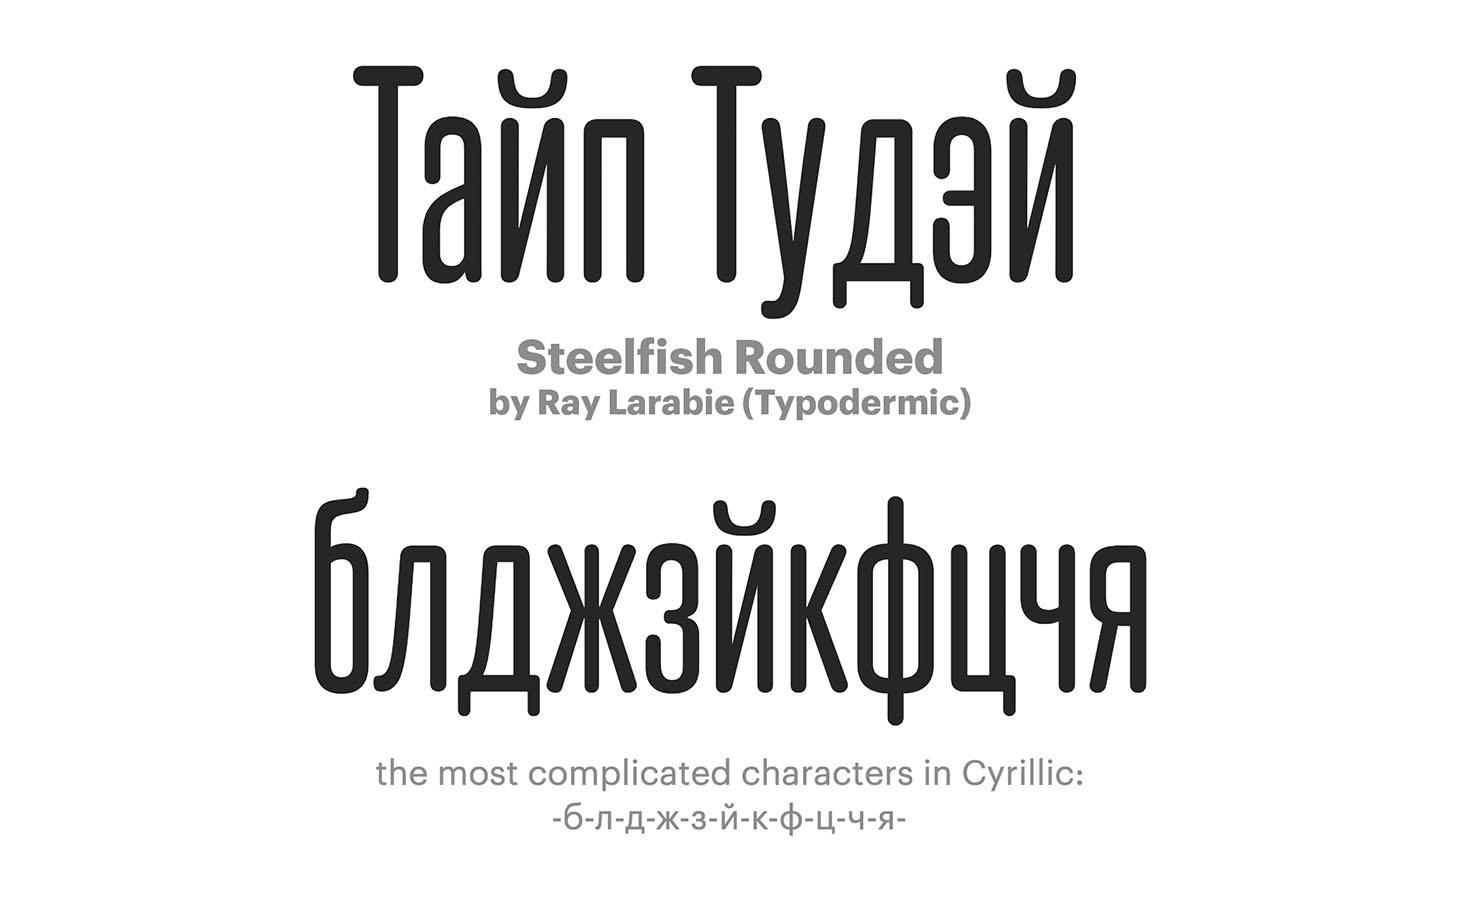 Steelfish-Rounded